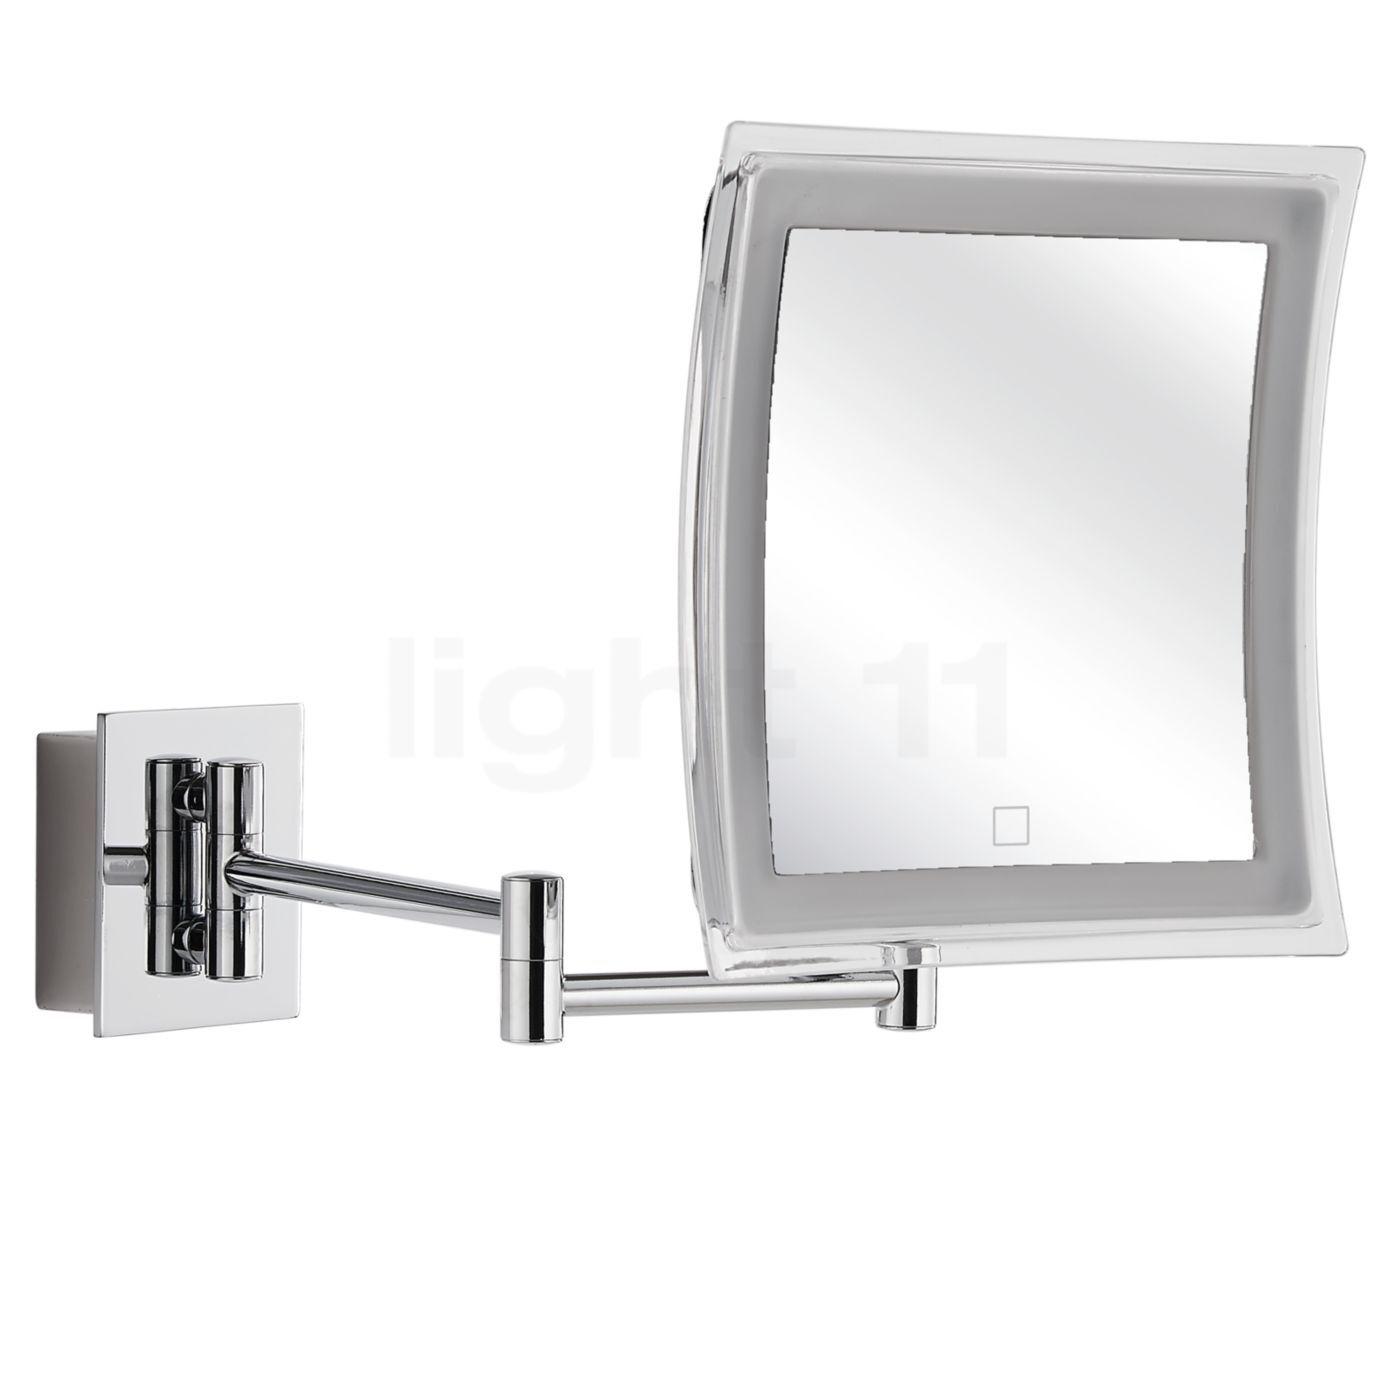 Decor Walther BS 84 Touch Miroir de maquillage mural LED, chrome brillant